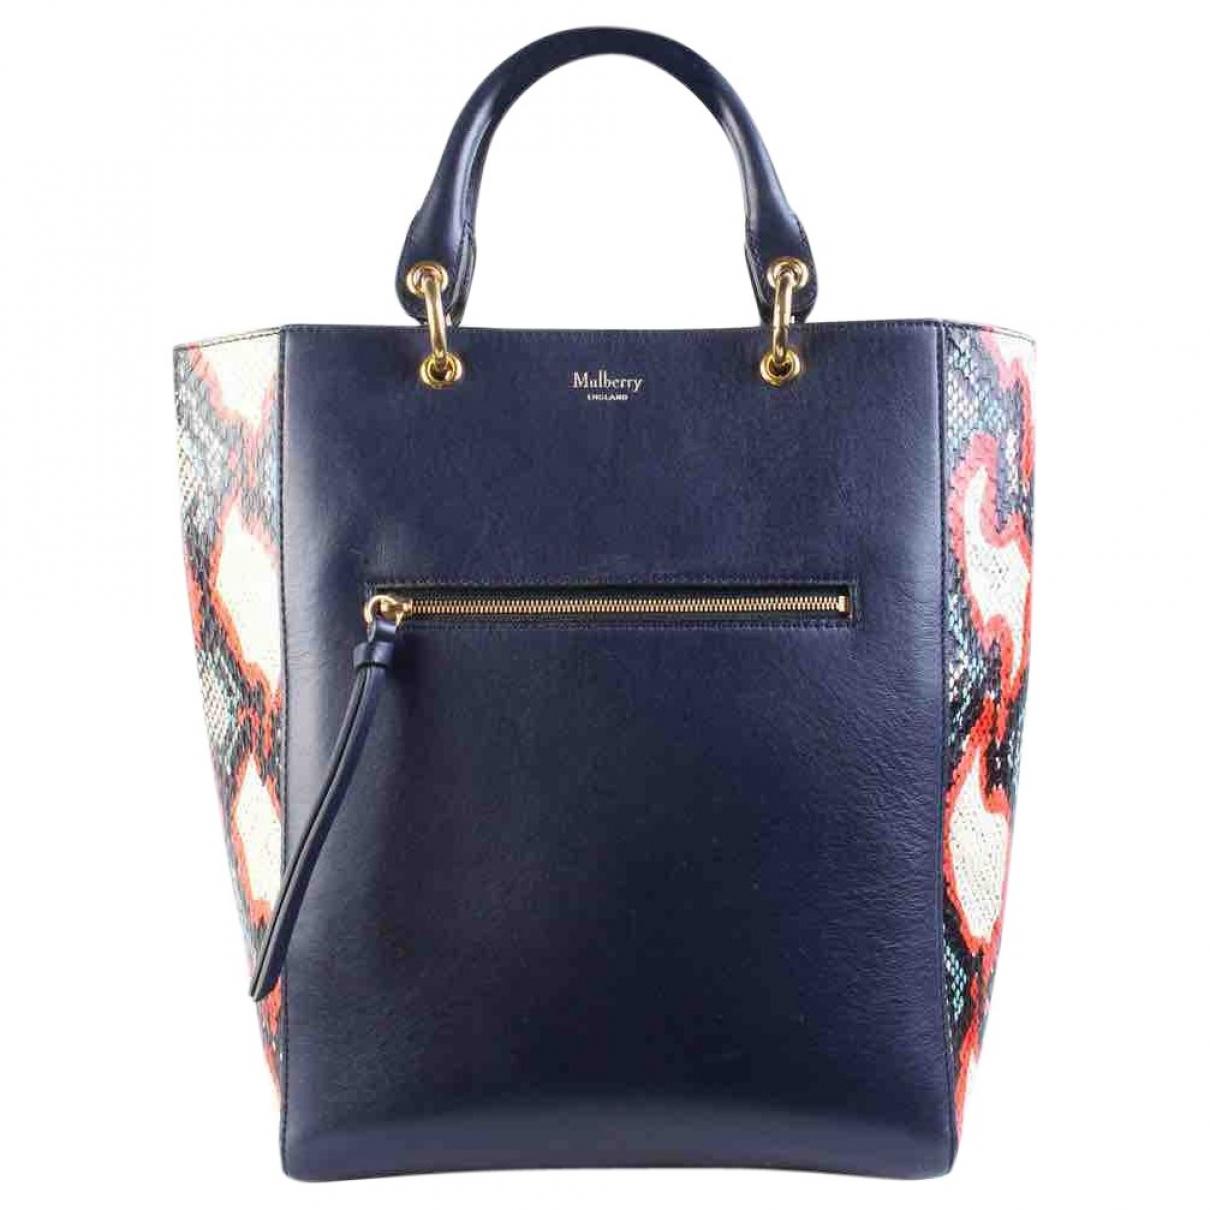 Mulberry \N Navy Leather handbag for Women \N